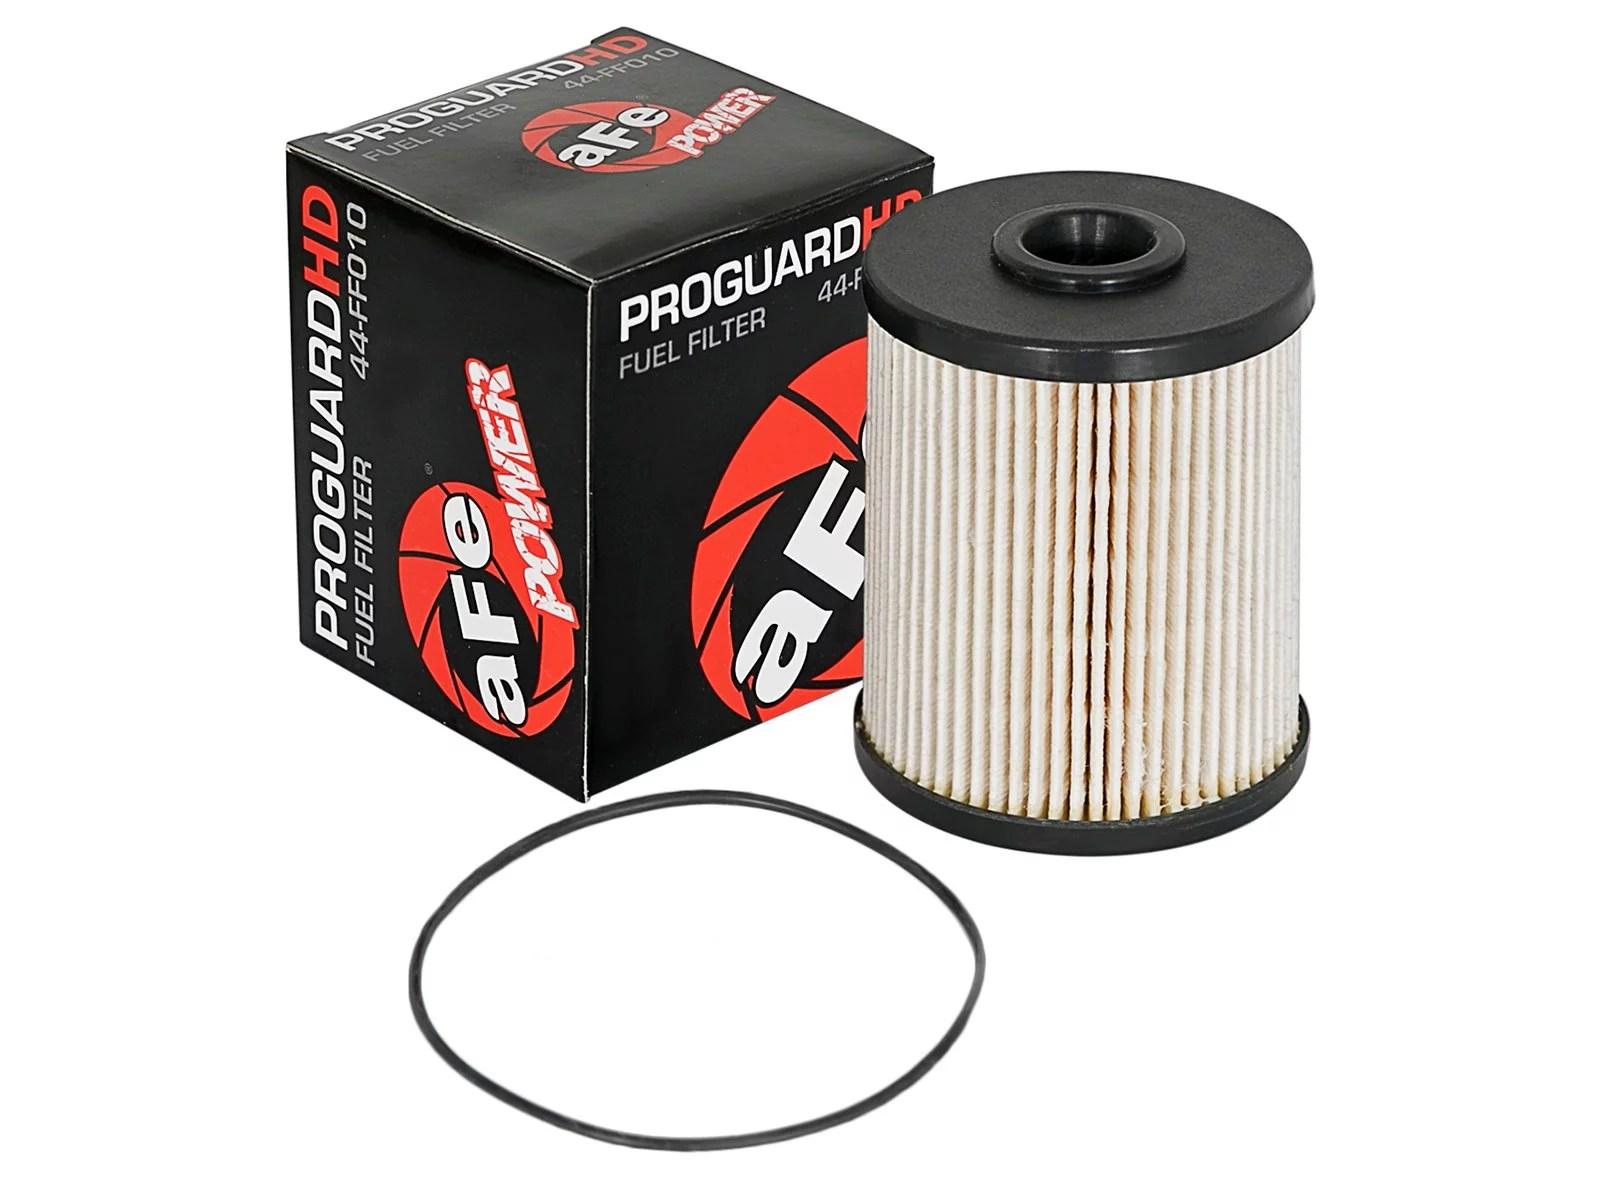 hight resolution of afe power 44 ff010 00 07 ram 2500 3500 cummins diesel l6 5 9l fuel filter walmart com